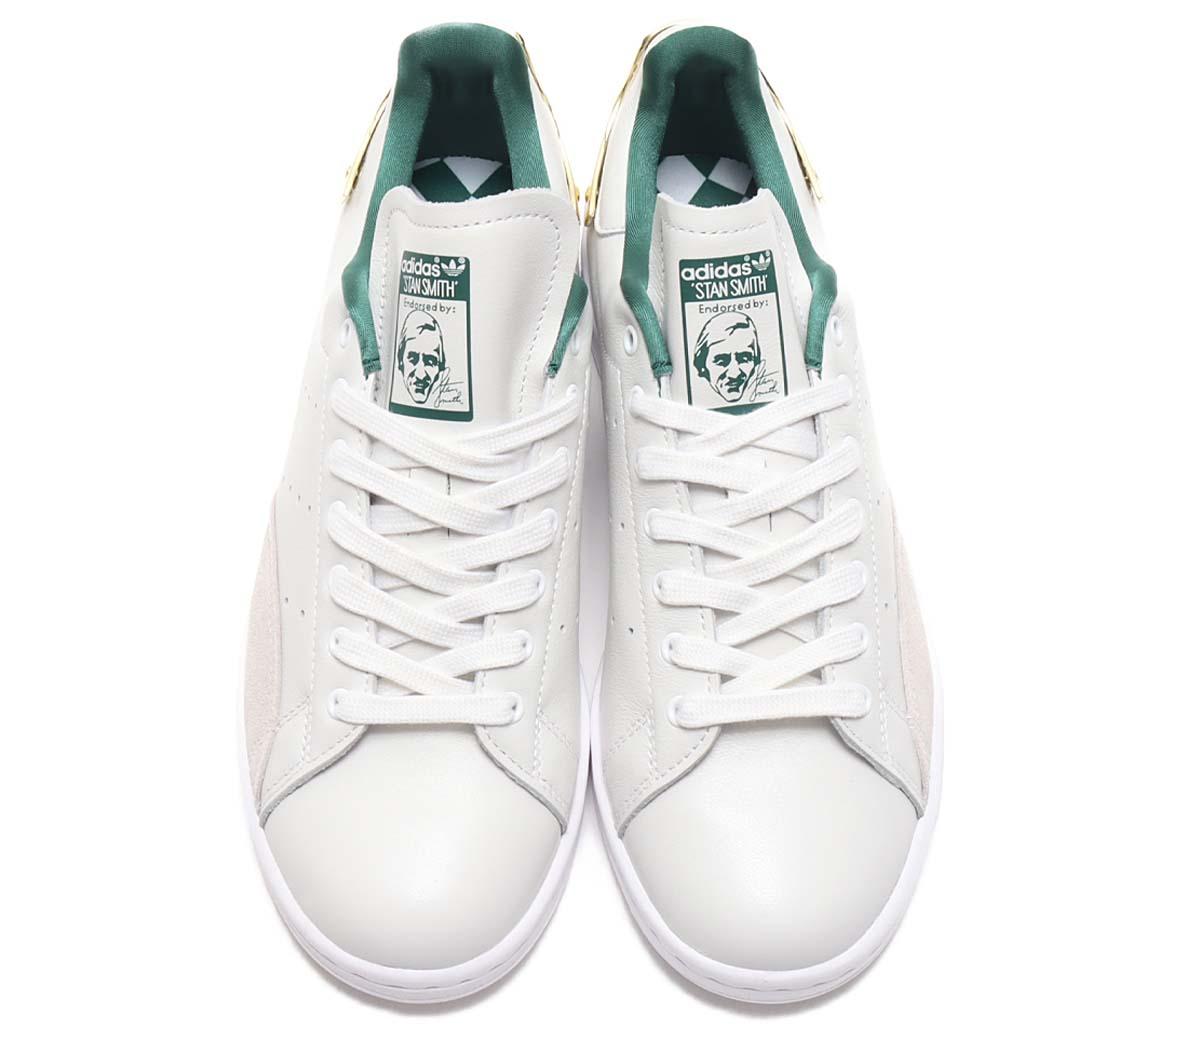 adidas STAN SMITH G FOOTWEAR WHITE / COLLEGE GREEN / GOLD METARICK FZ5395 アディダス スタンスミス ゴールド ホワイト/メタリックゴールド